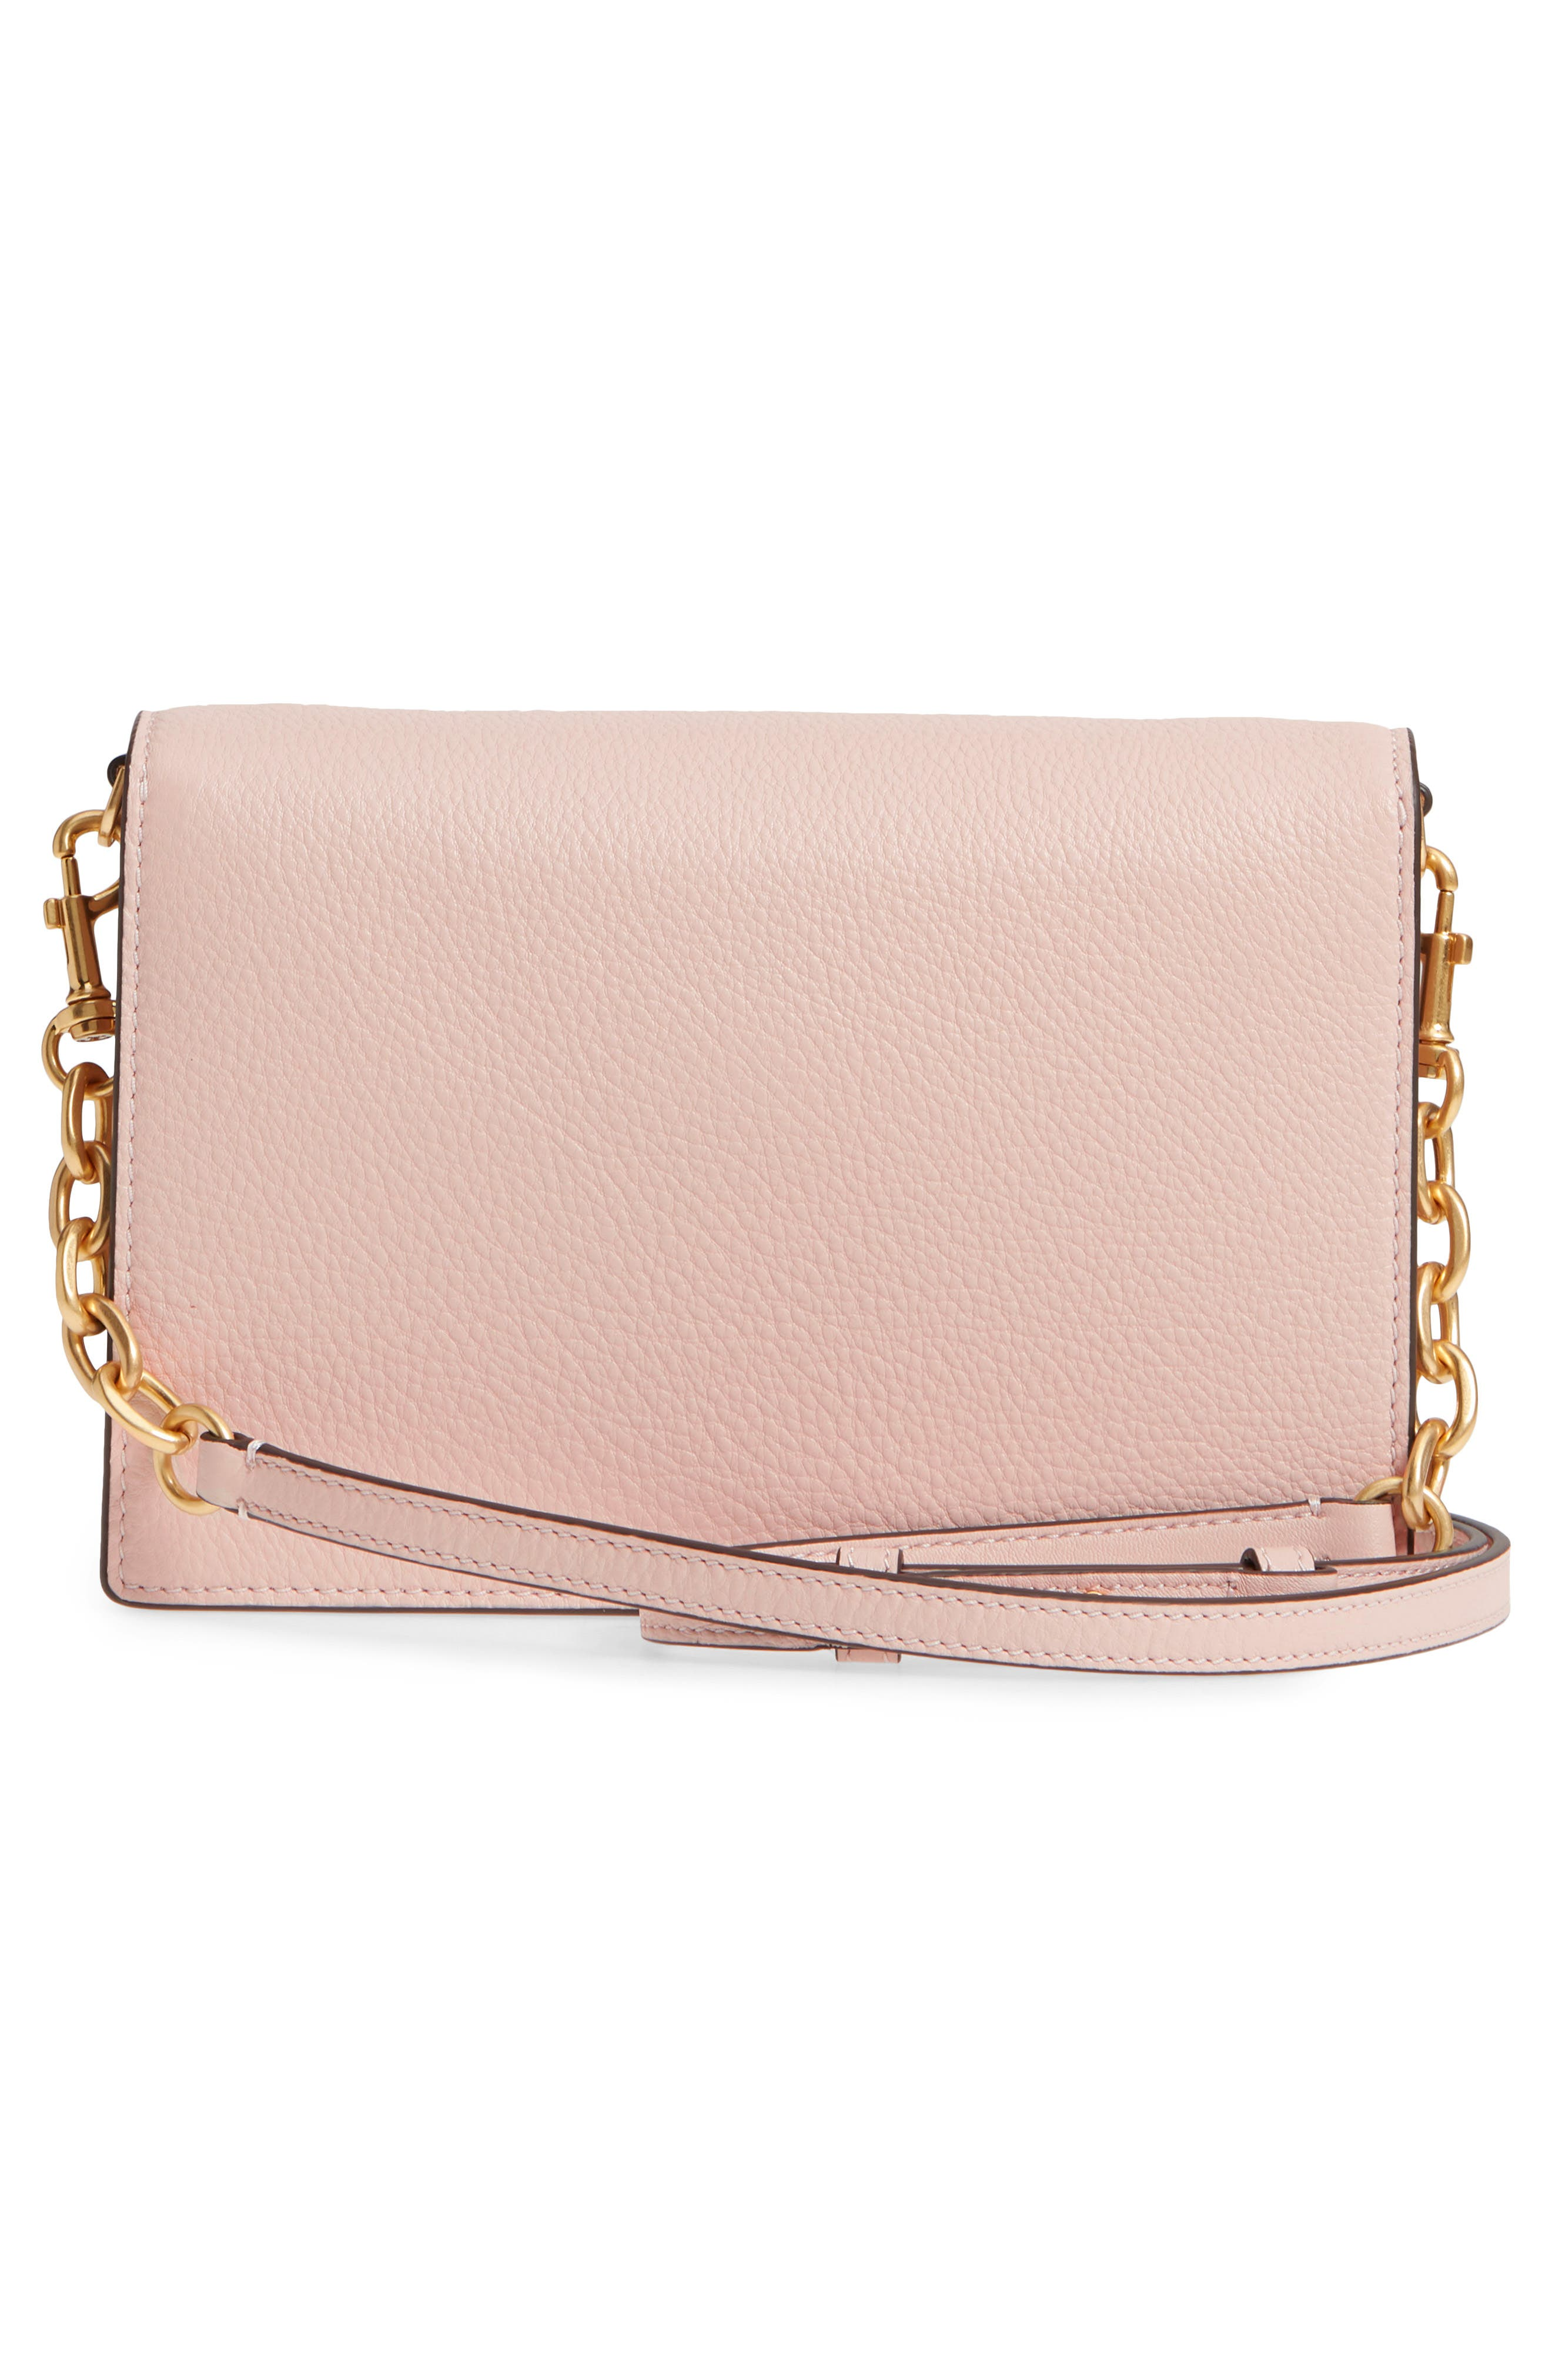 Georgia Pebble Leather Shoulder Bag,                             Alternate thumbnail 5, color,                             Shell Pink